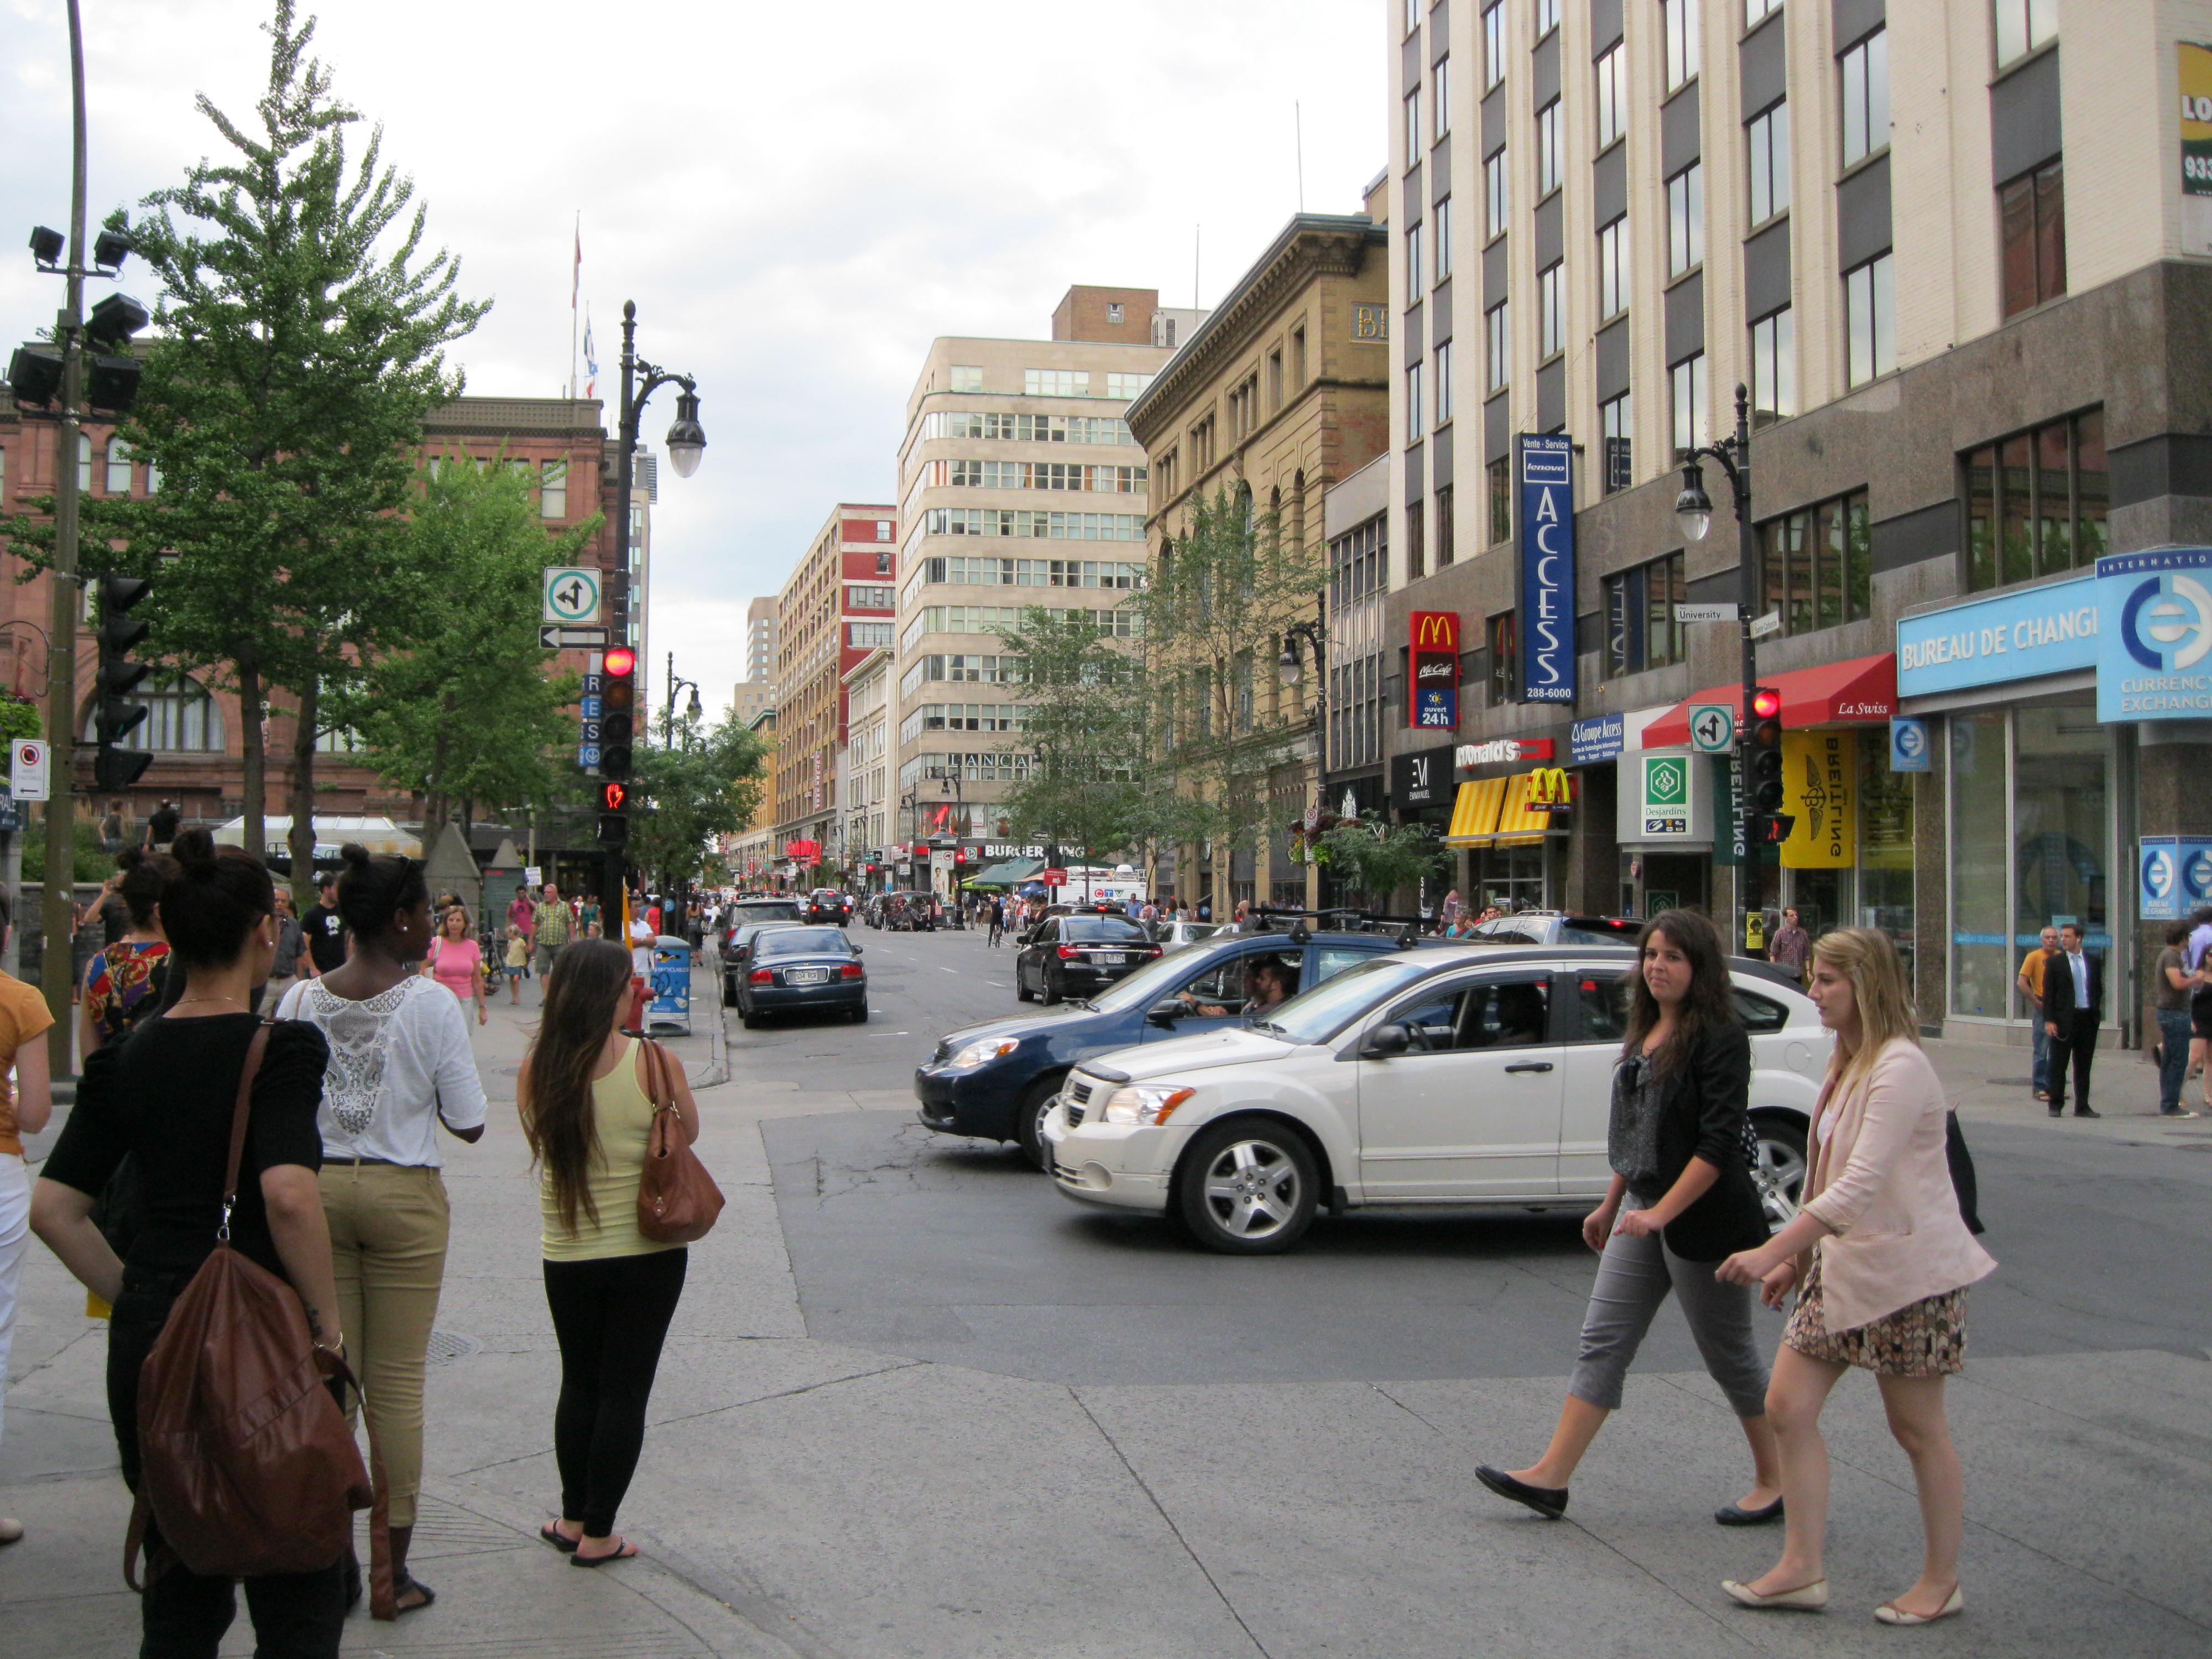 File:rue sainte catherine montreal 02.jpg wikimedia commons